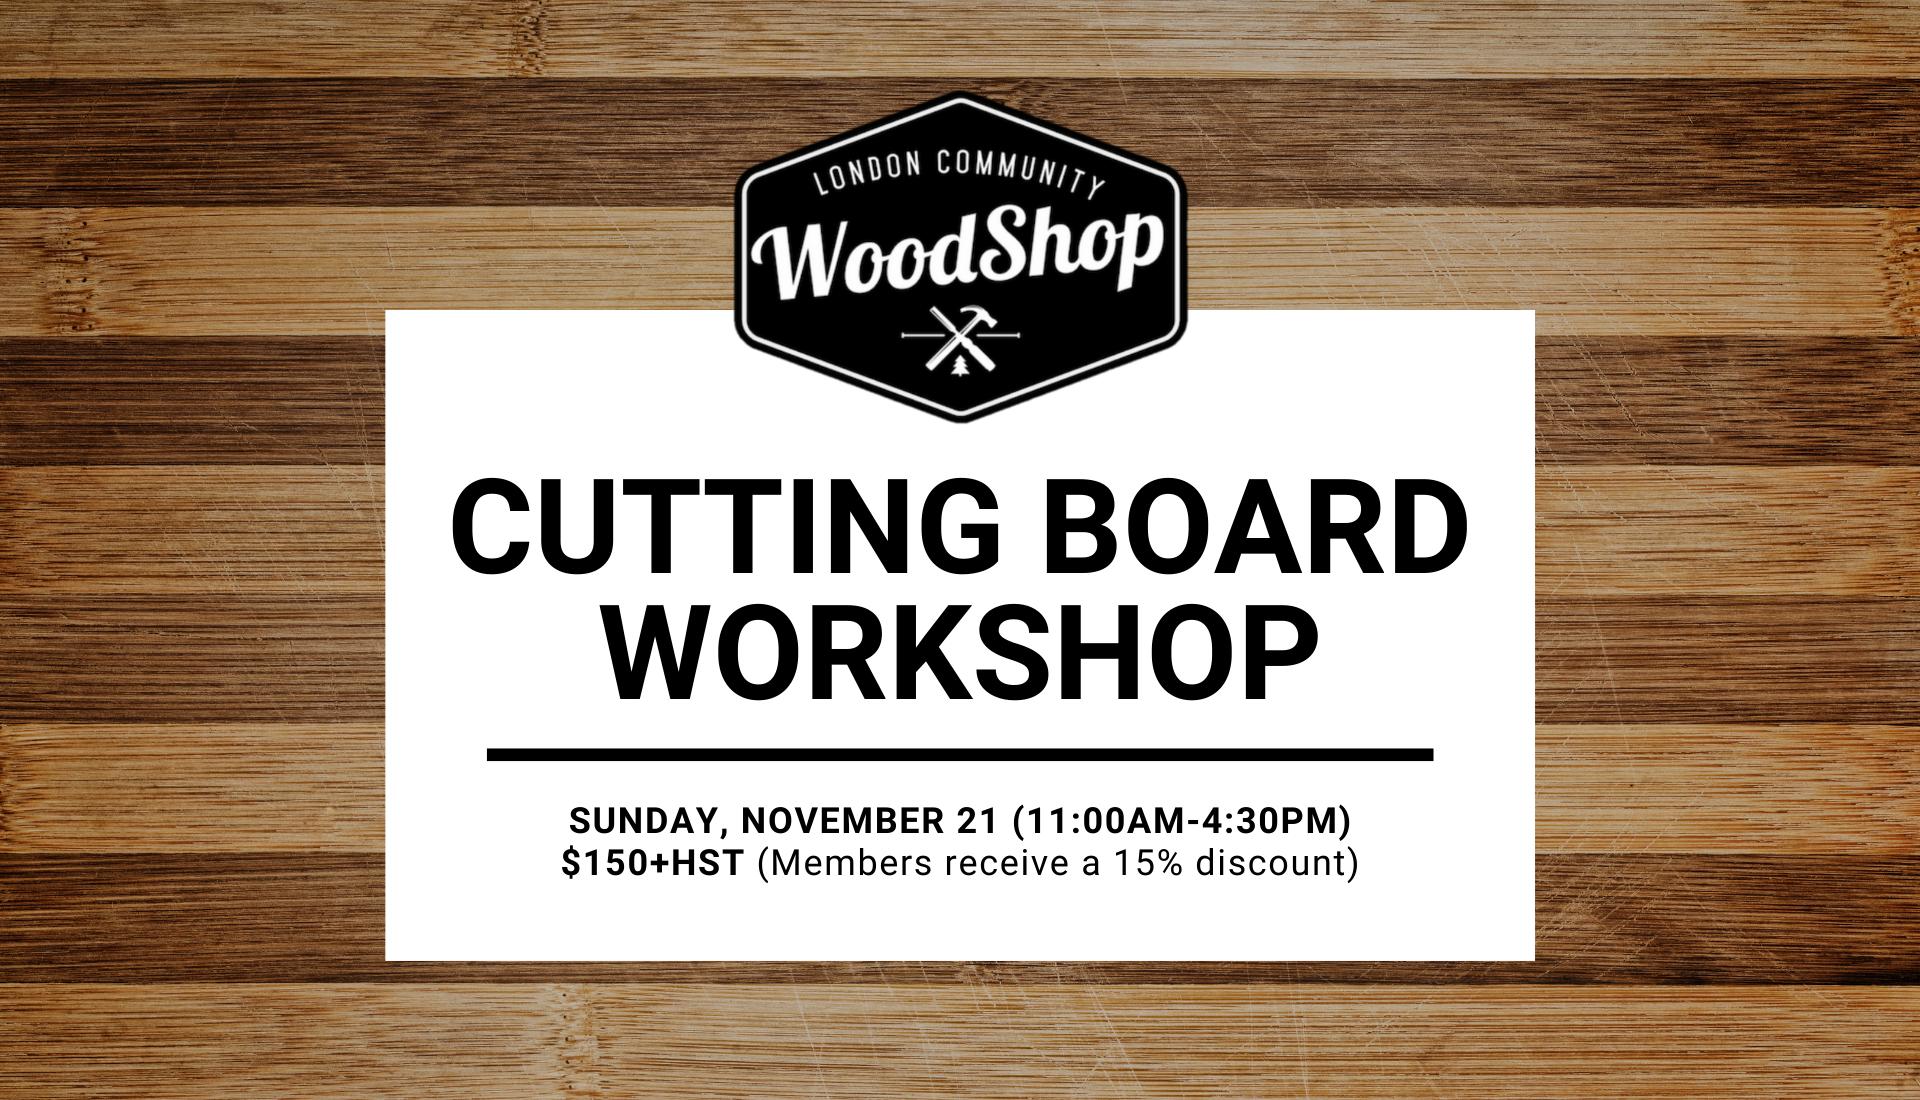 Cutting Board Workshop Sunday November 21